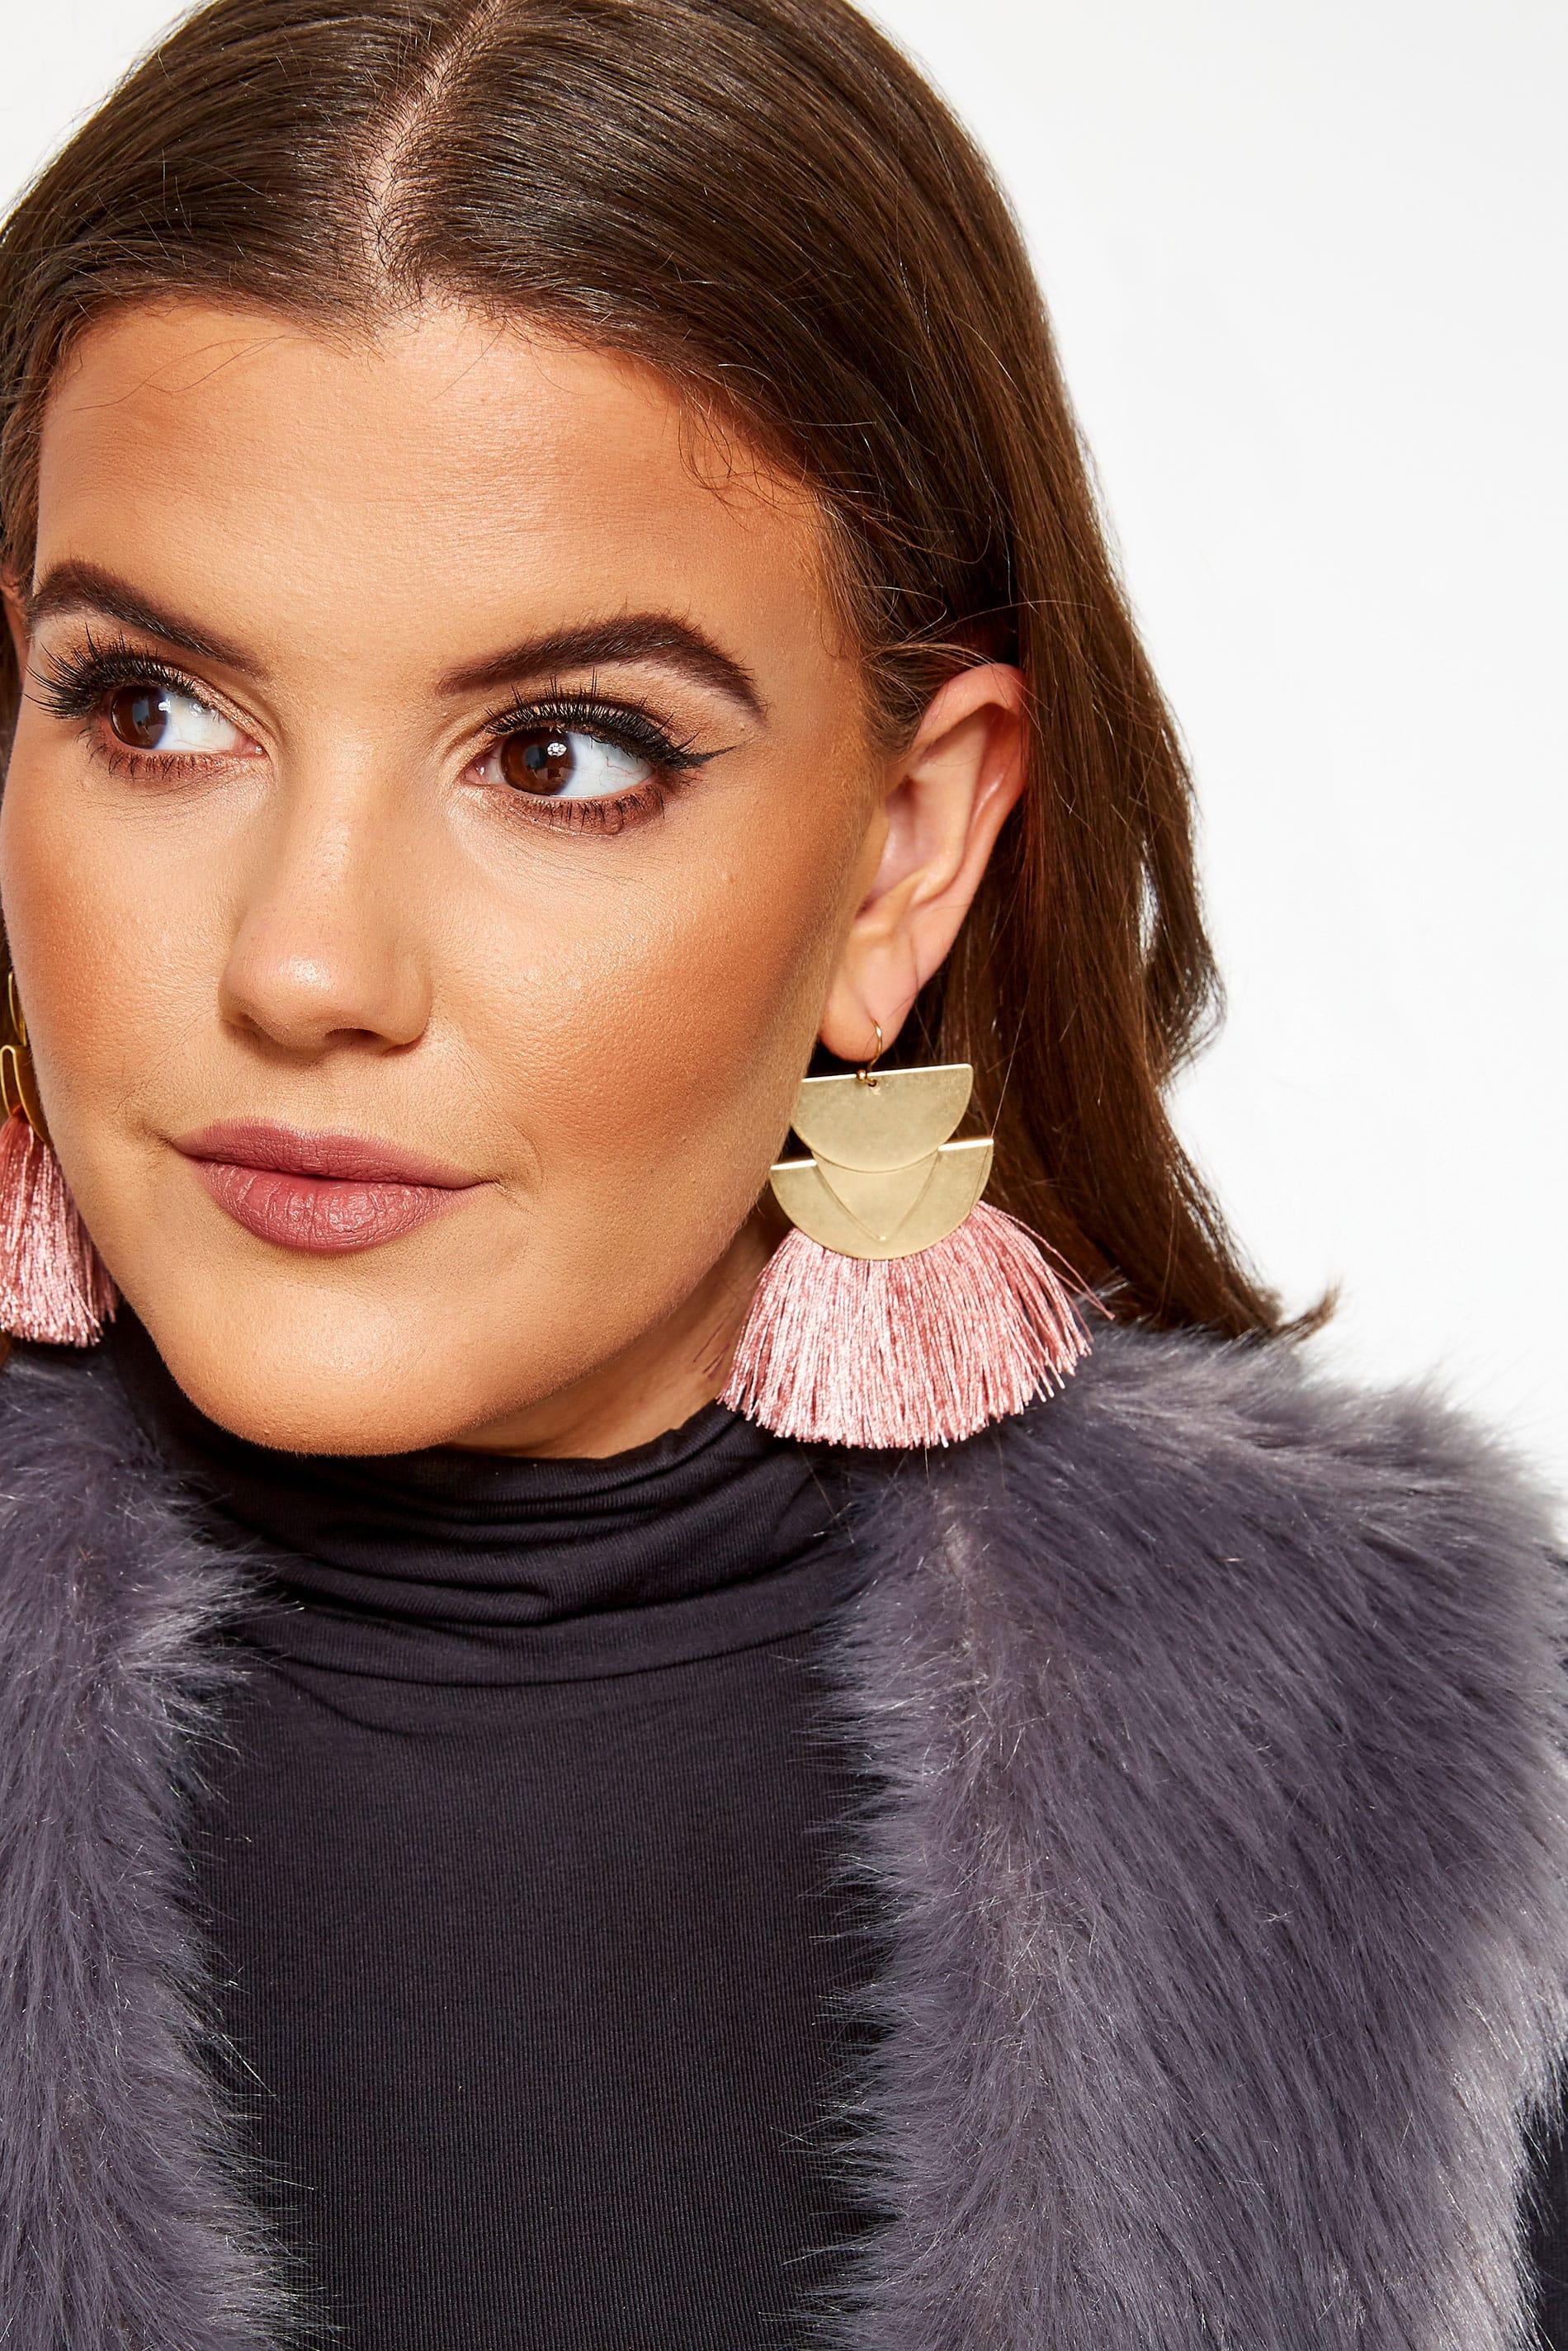 Gold and Pink Tassel Earrings_0a0d.jpg